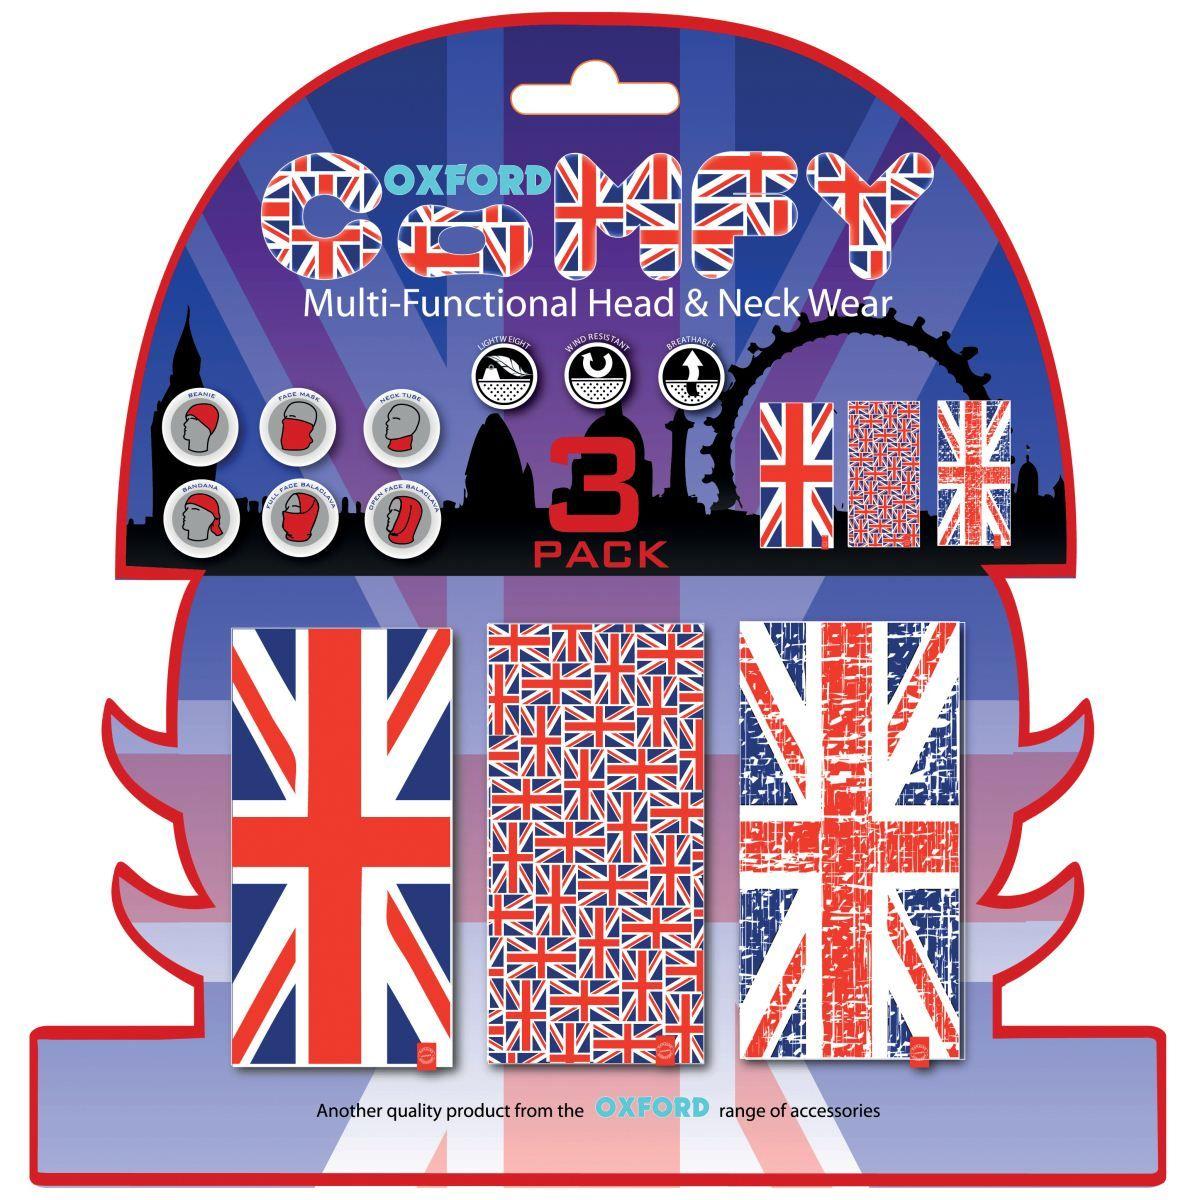 Braga Confort Union Jack (Bnadera UK) pack de 3 Oxford NW120